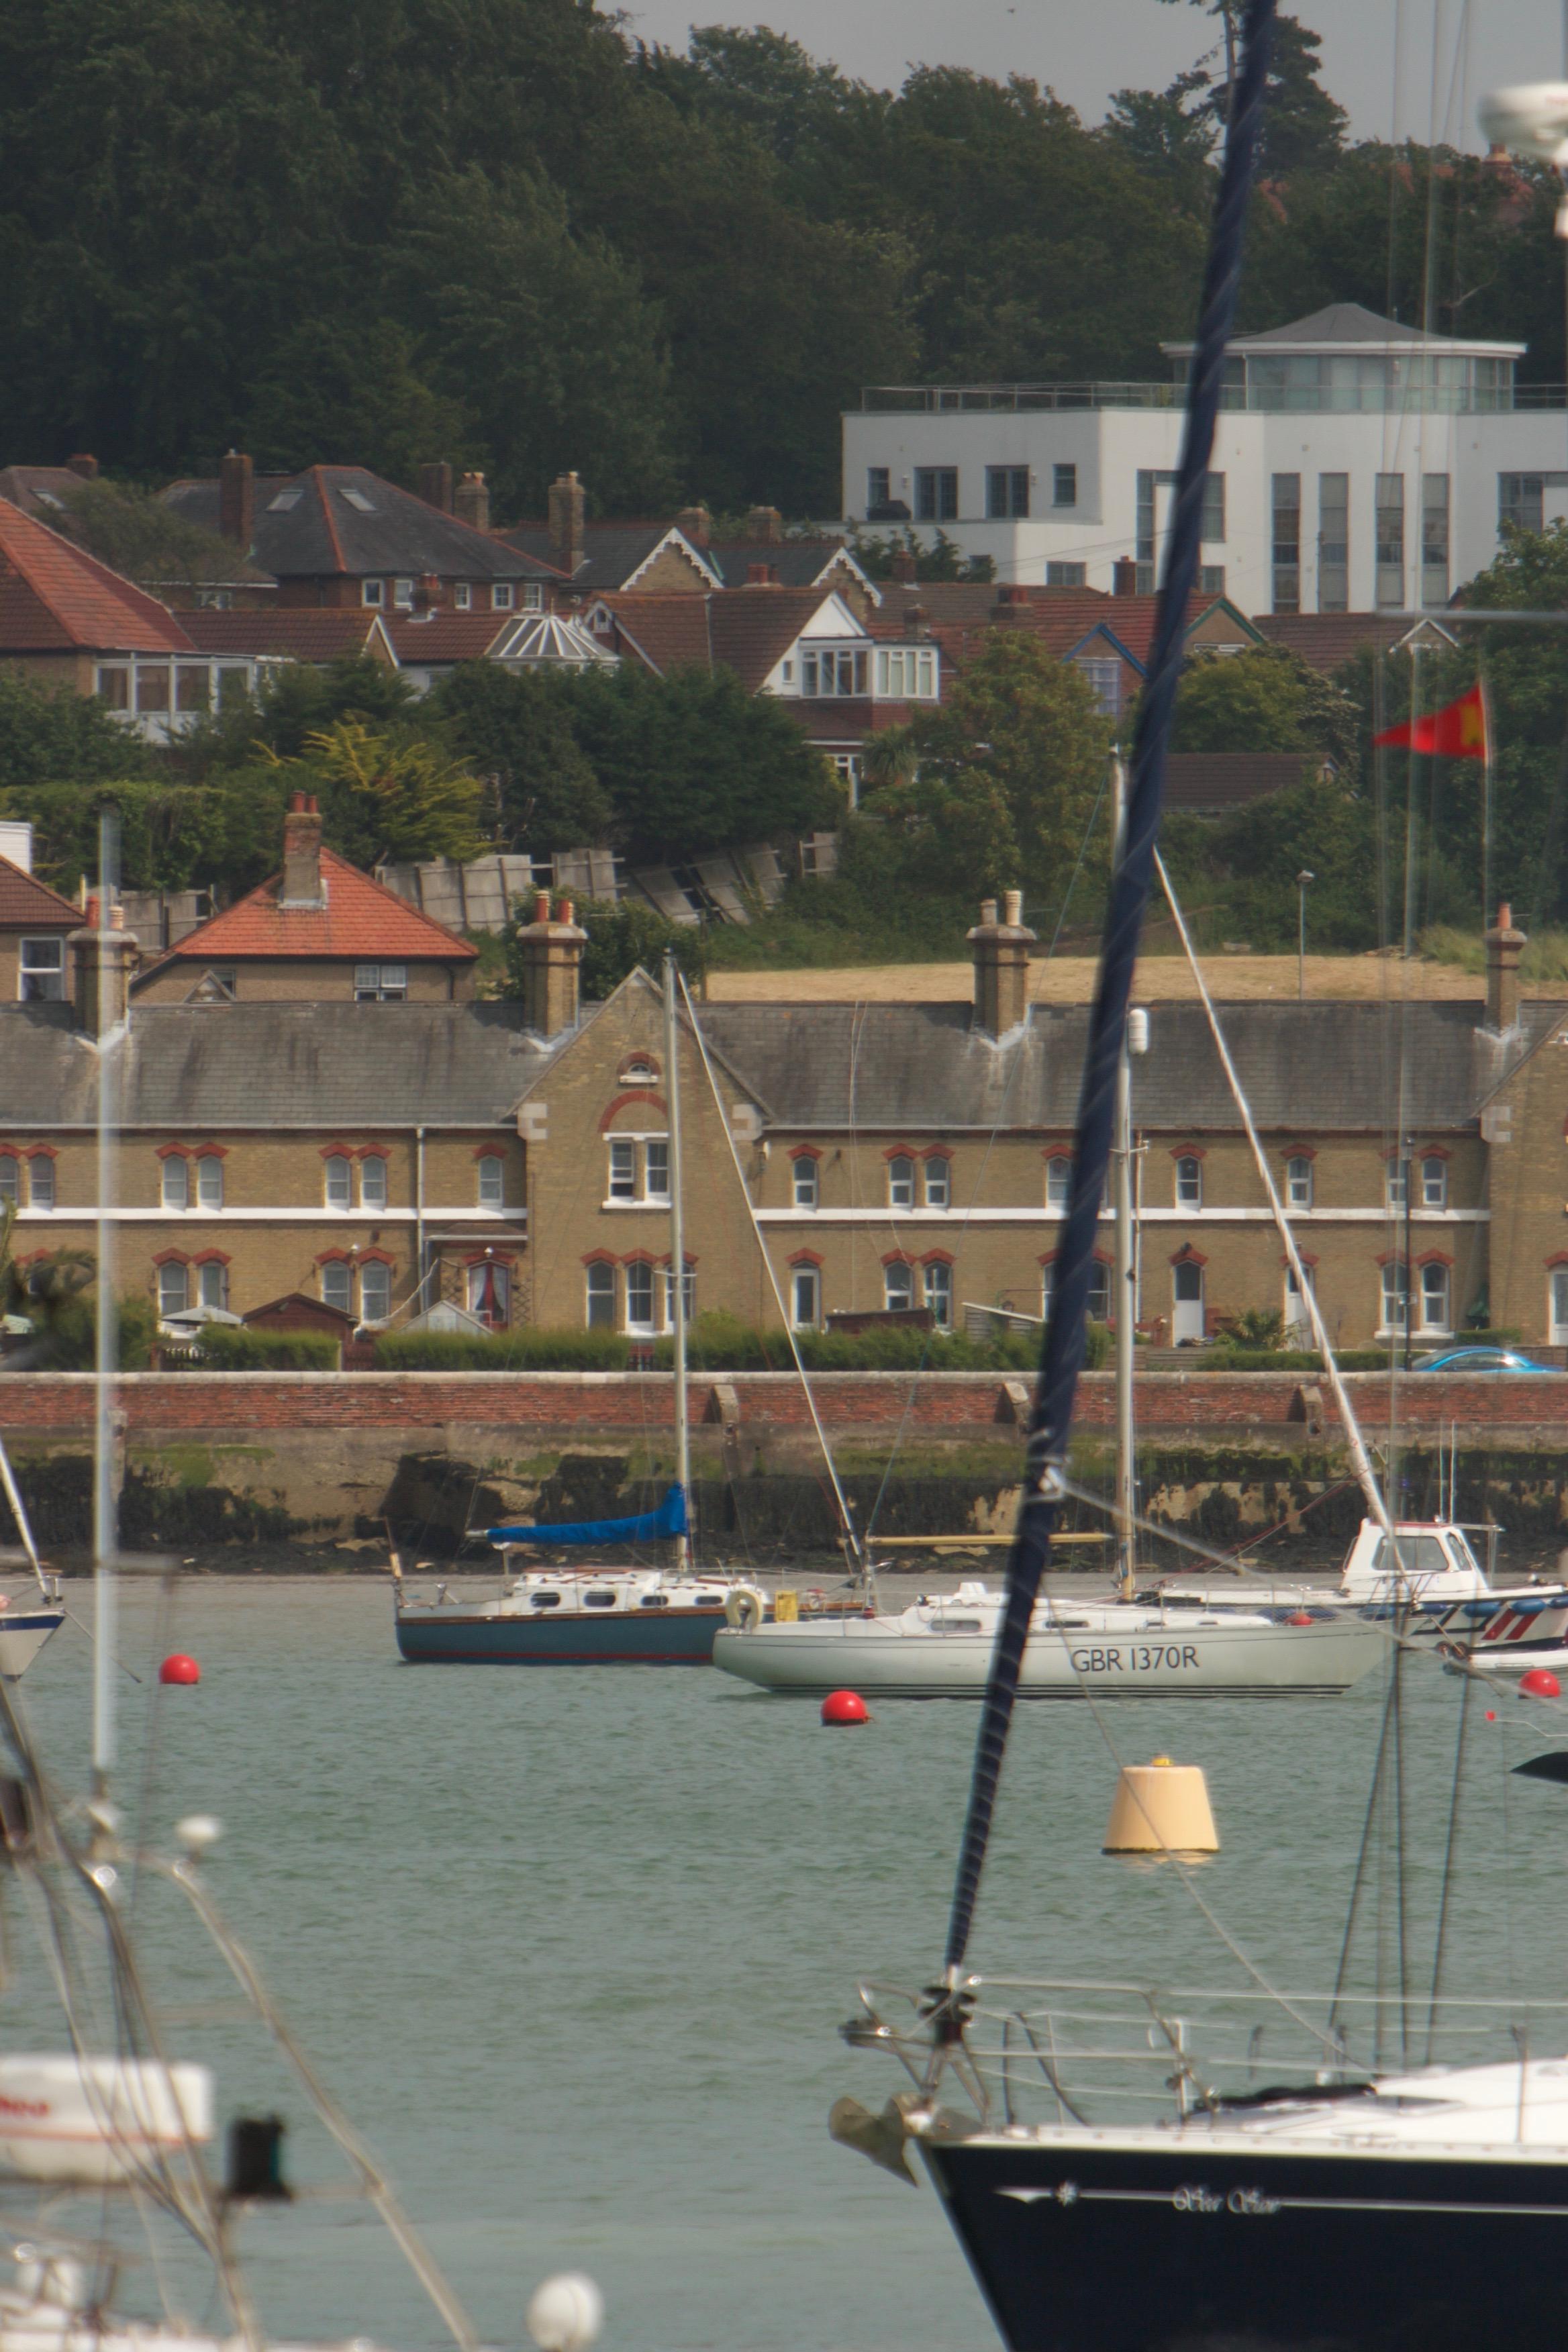 Coastguard Cottage from the sea